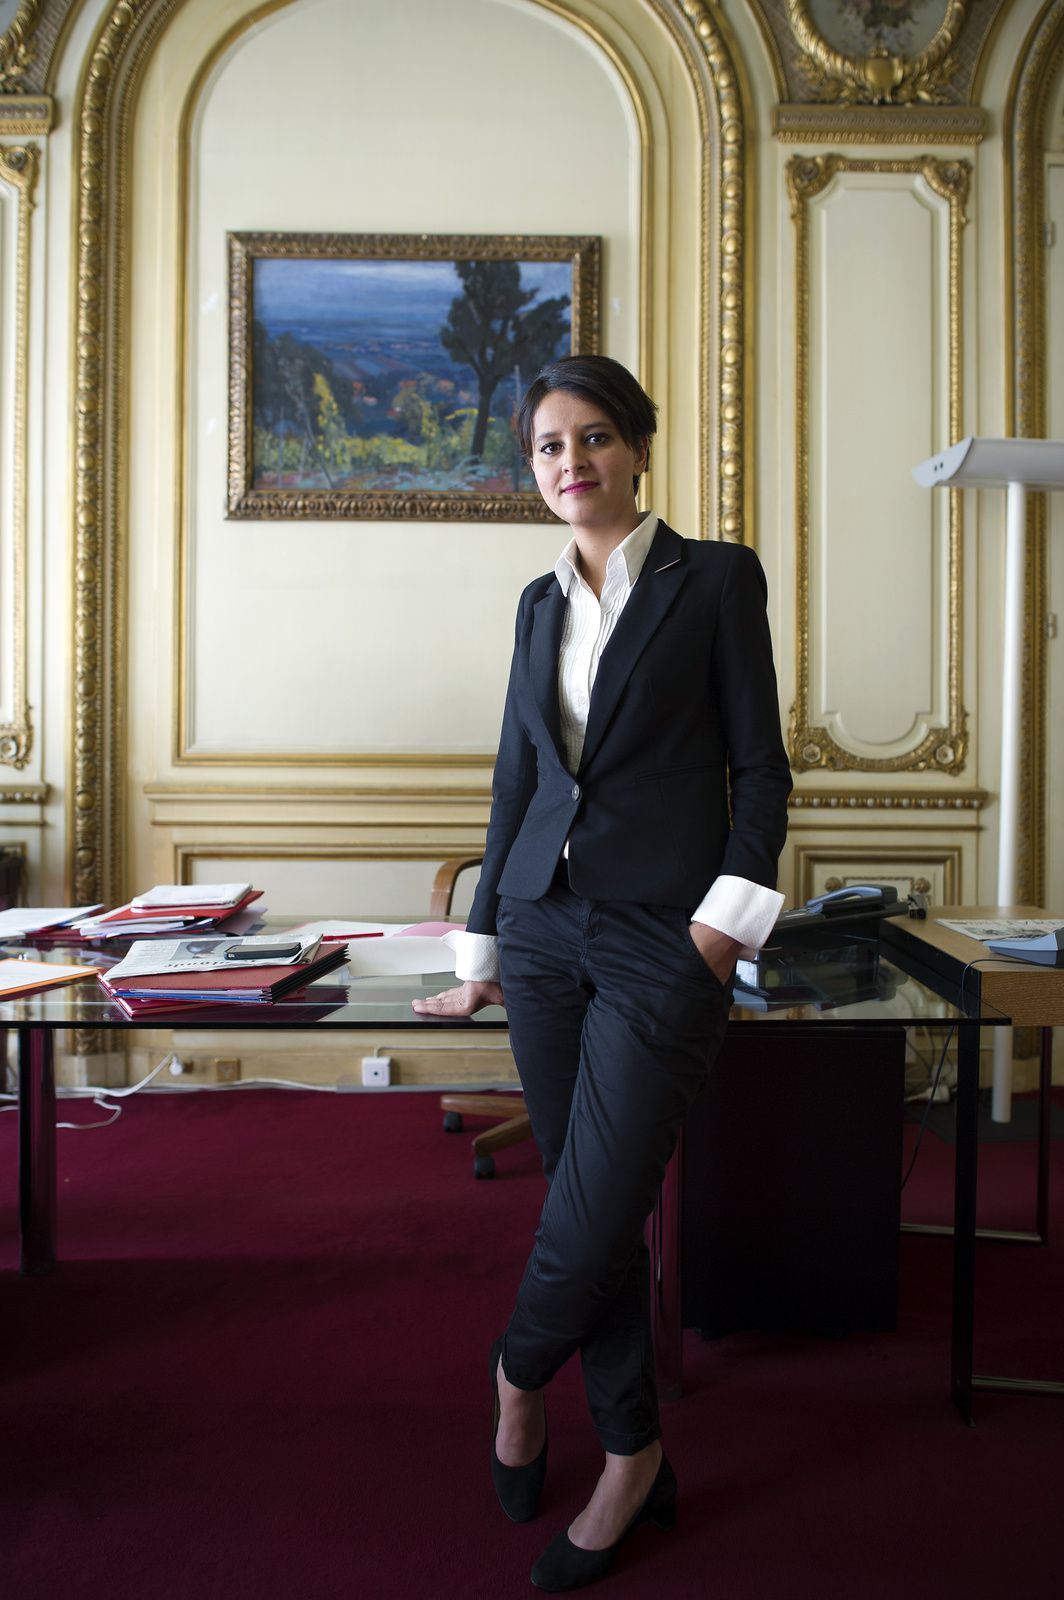 Najat Vallaud-Belkacem NVB sexy élections jupe robe upskirt présidentielles candidate député jambes belle pieds collants talons valls éducation naionale